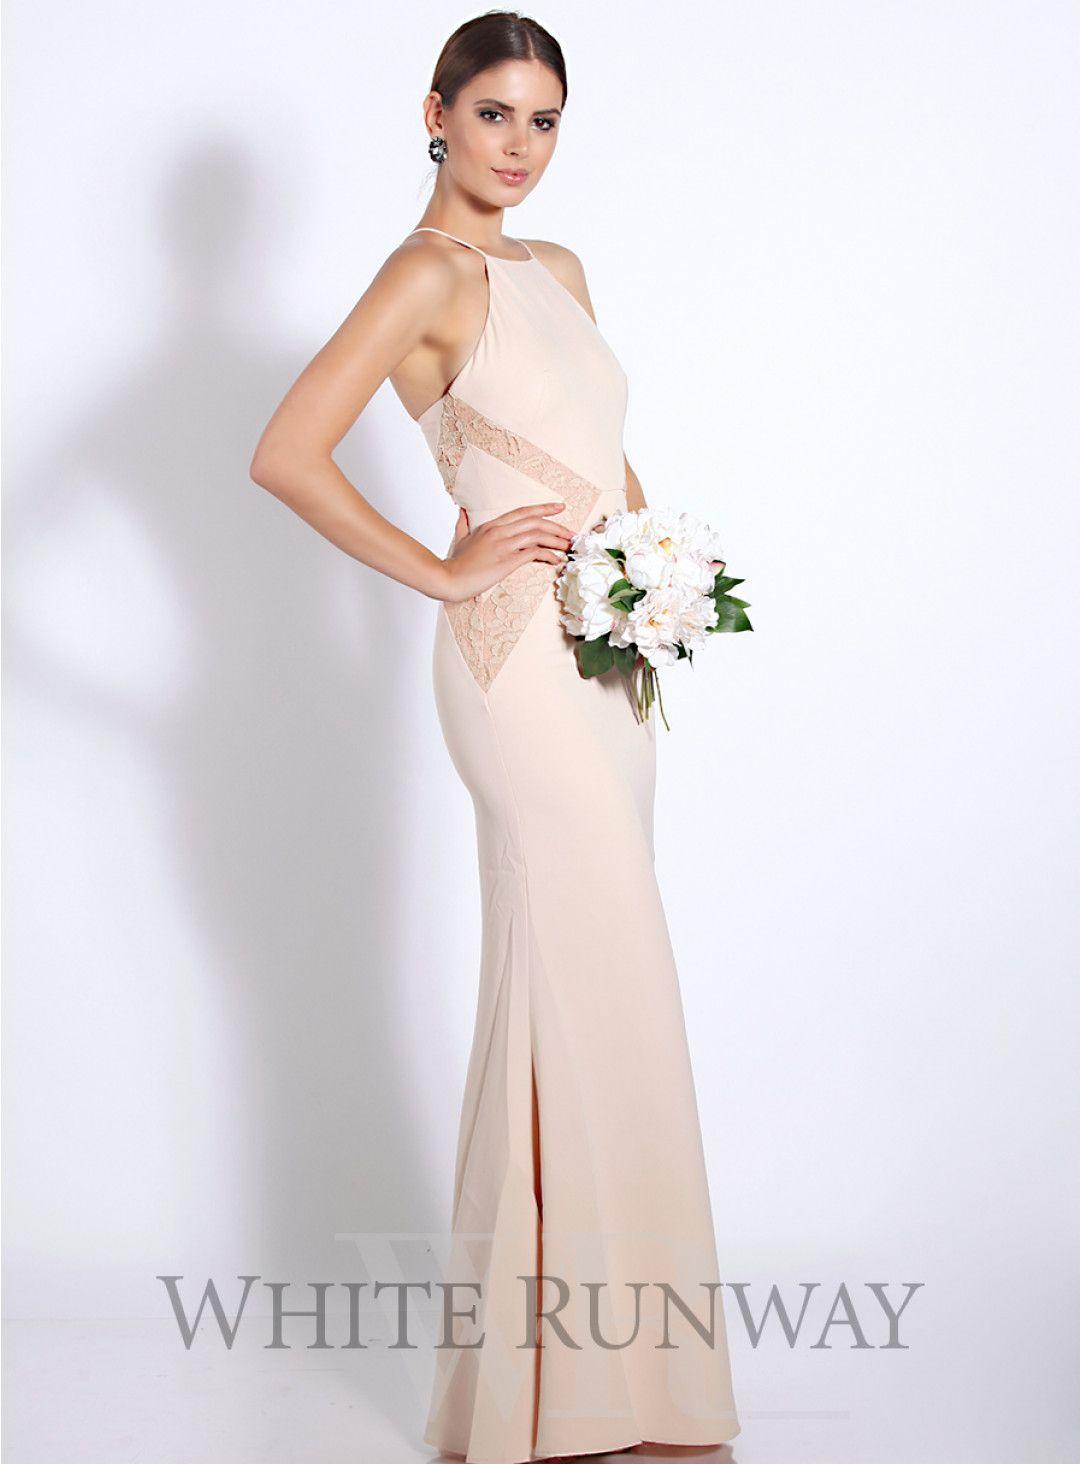 Isabella dress a stunning full length dress by australia designer